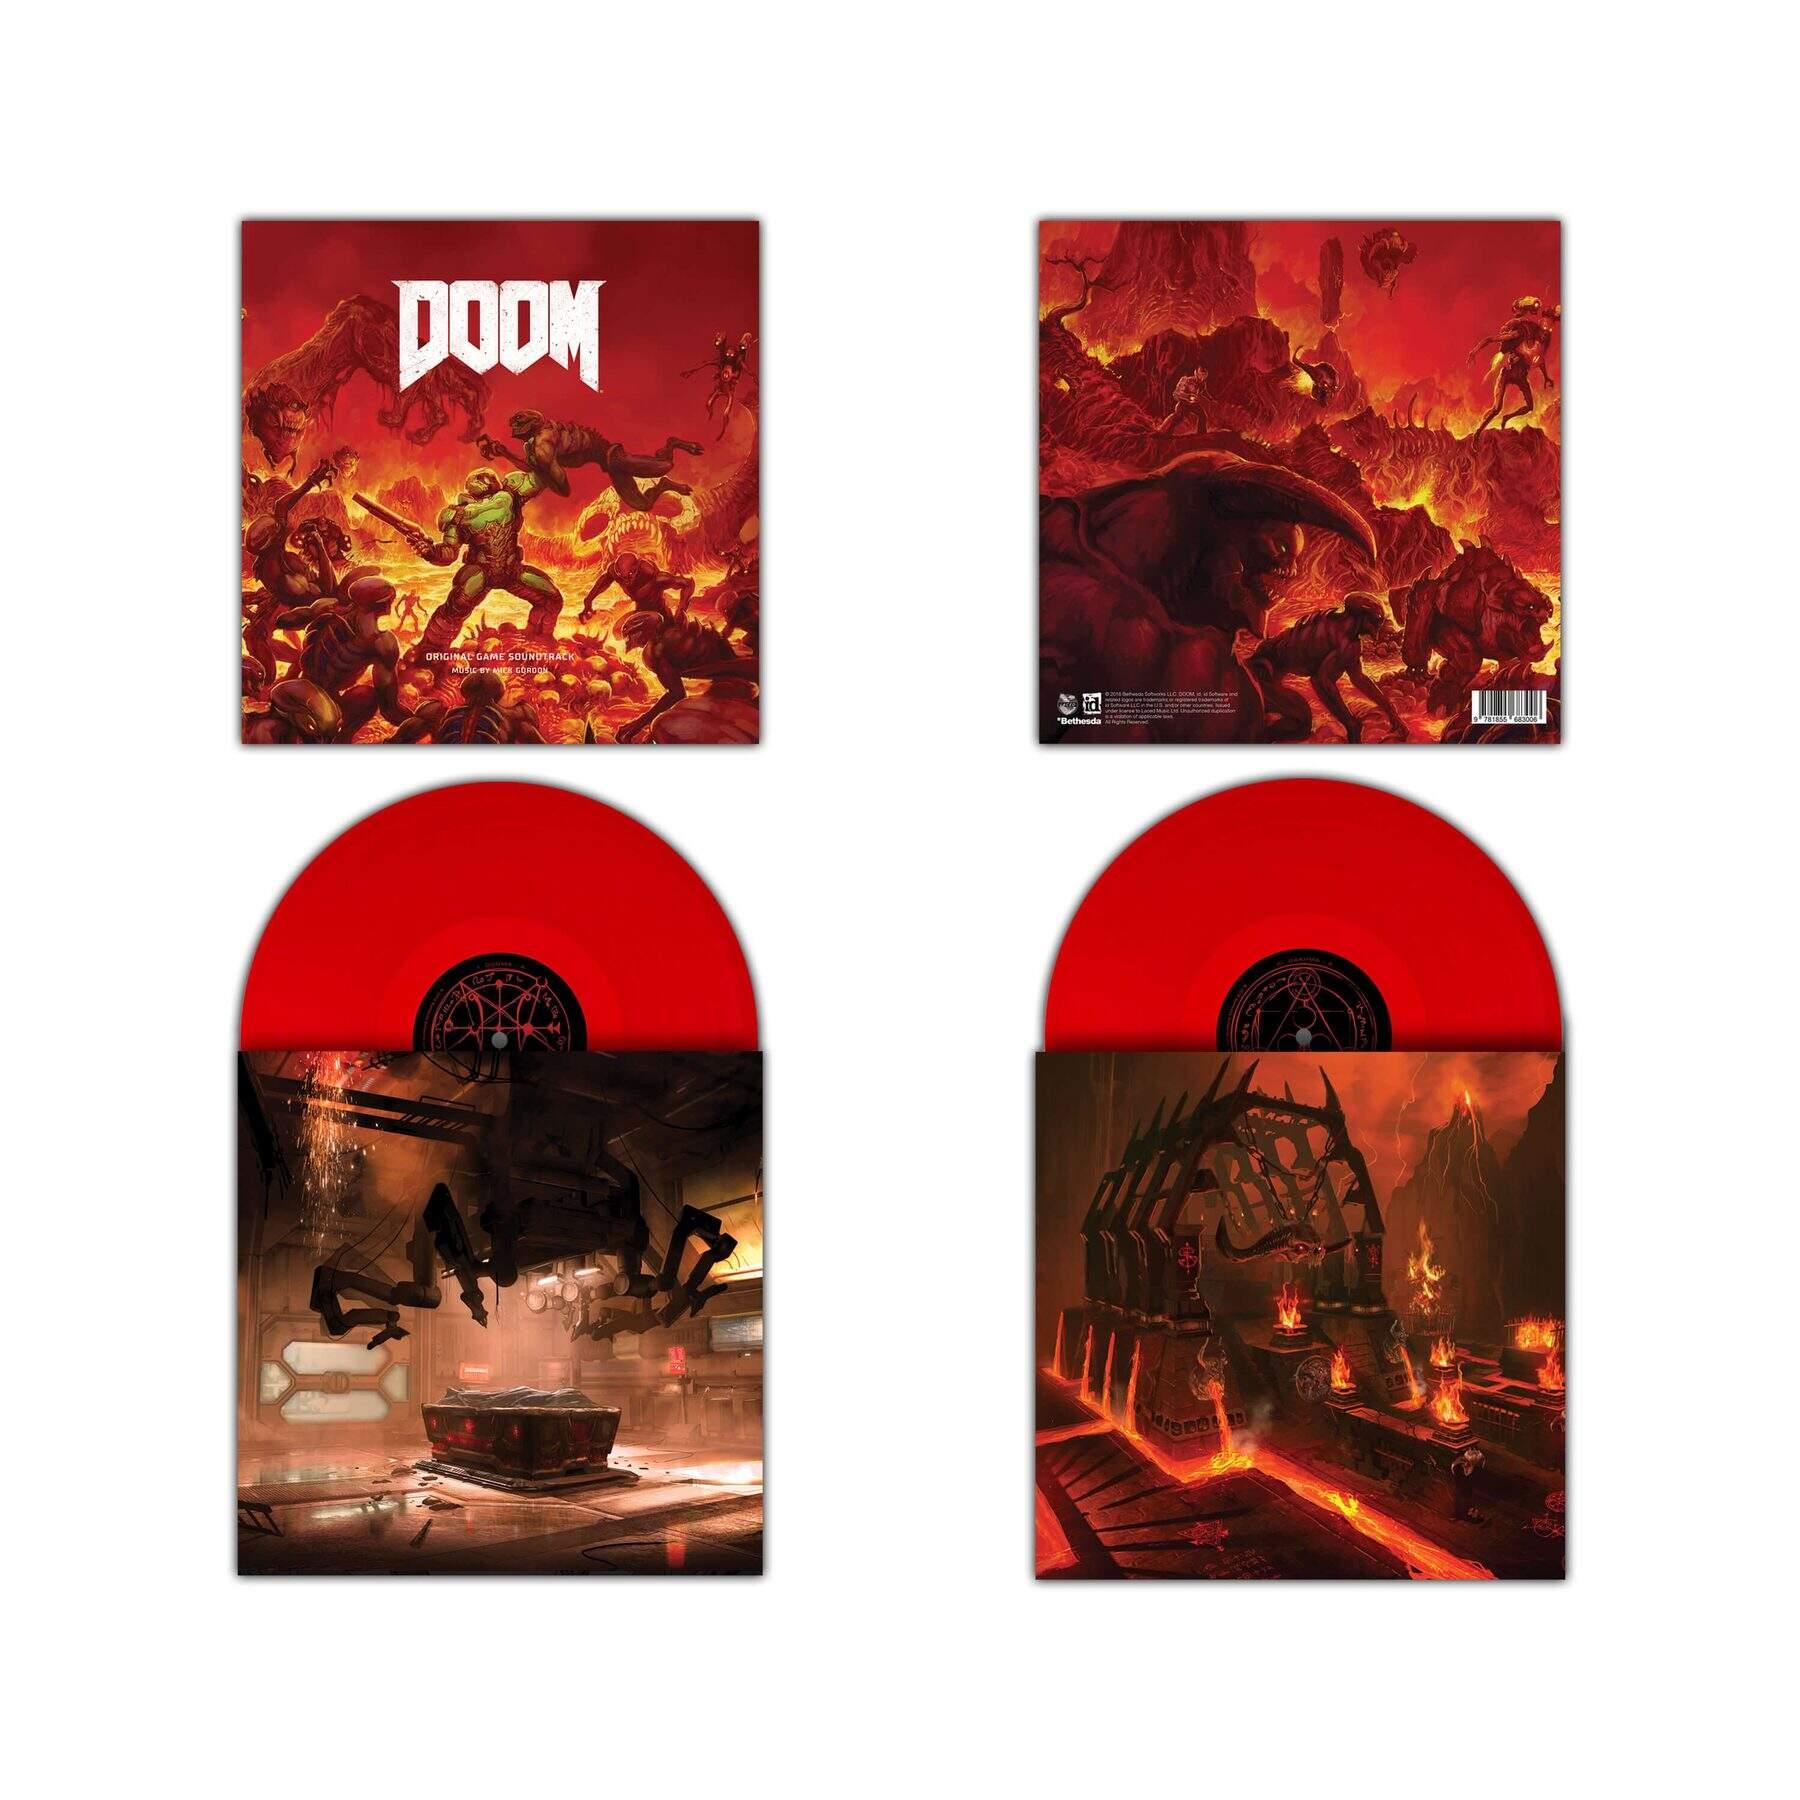 DOOM Soundtrack Colored Vinyl